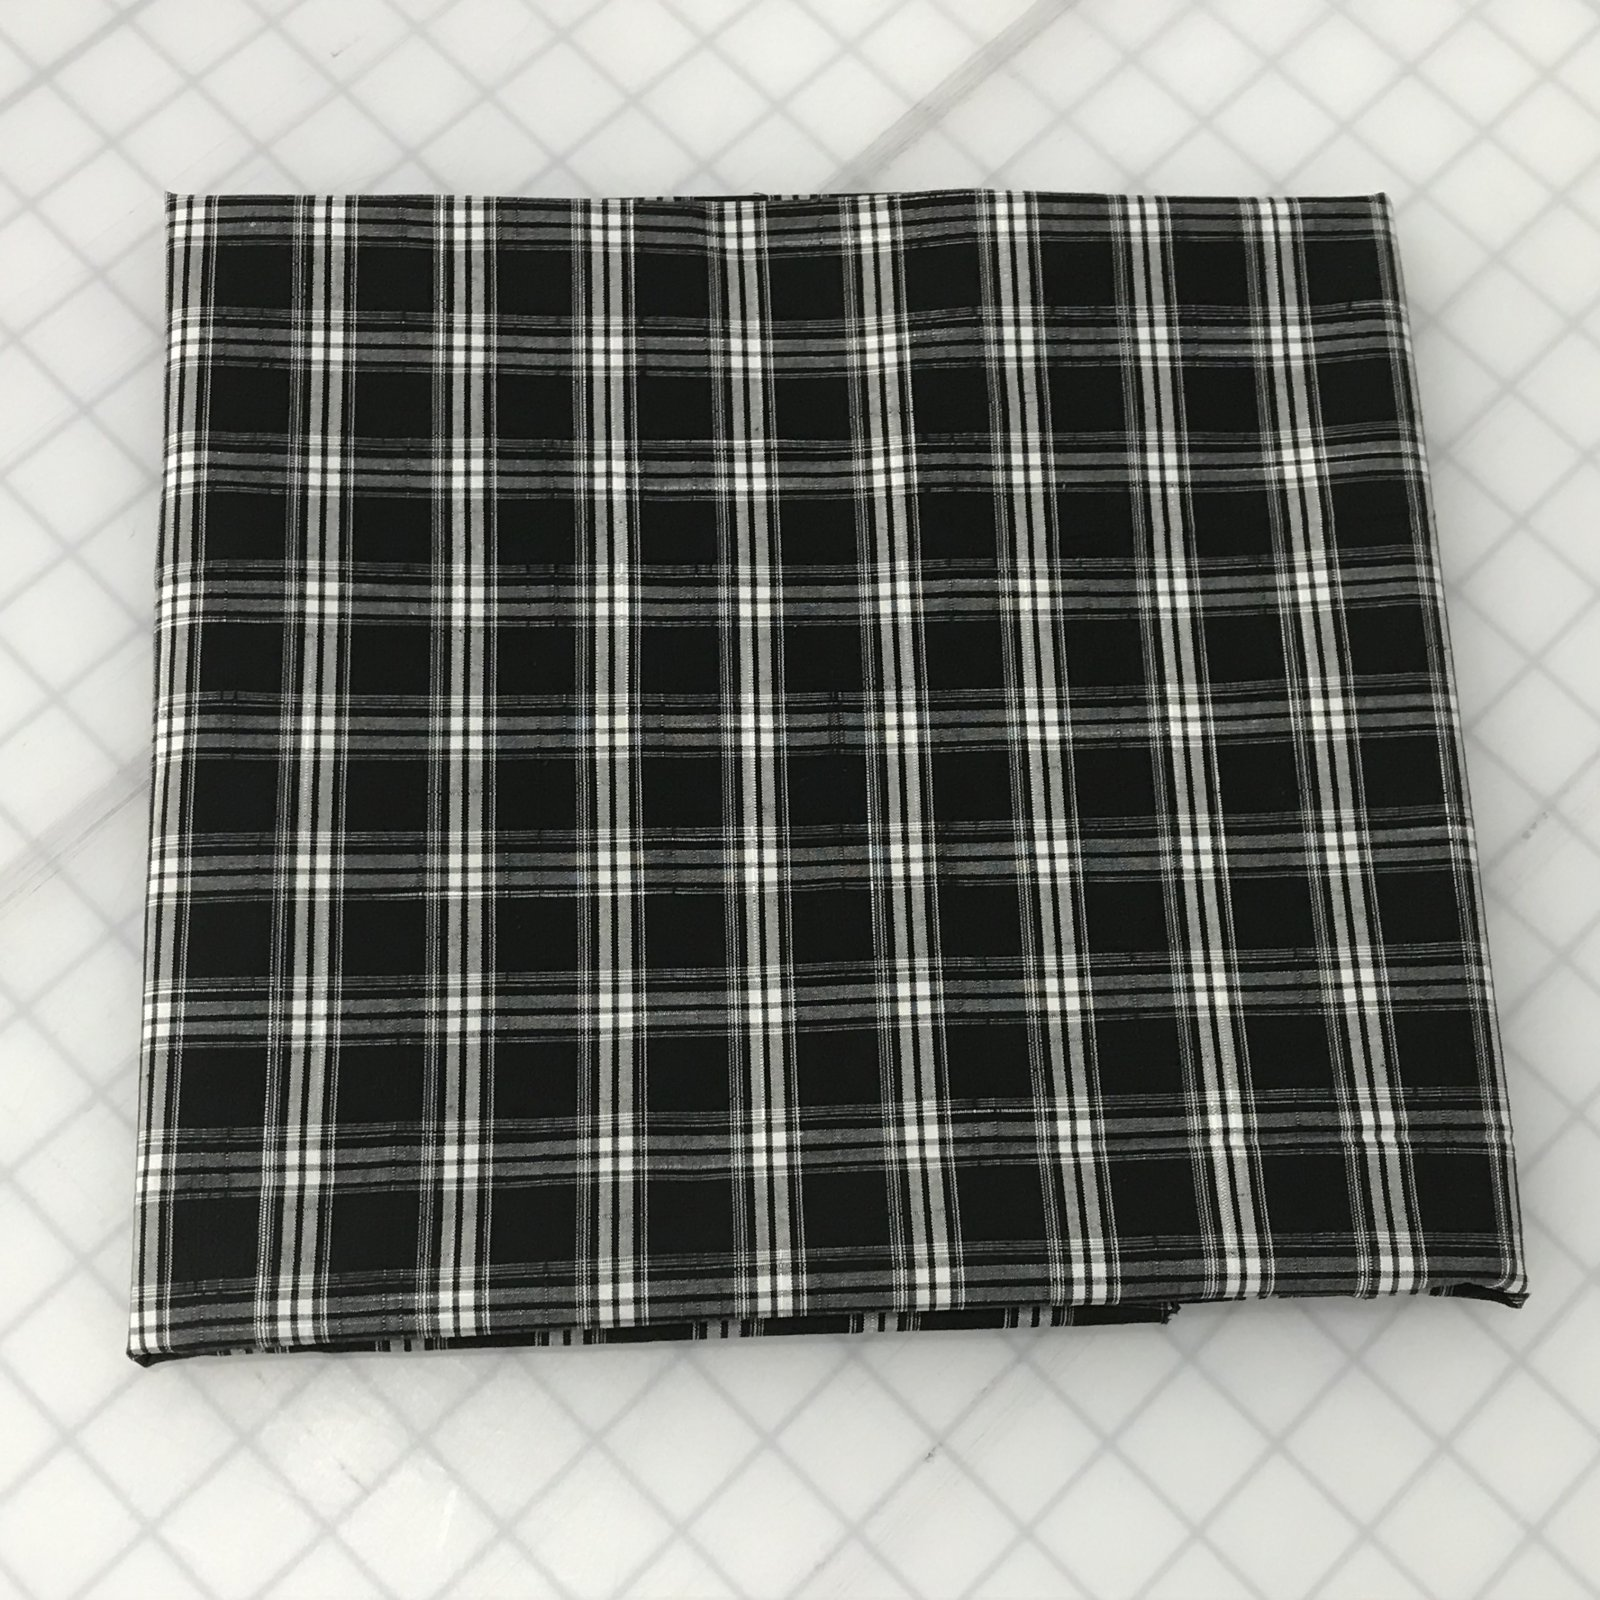 Shirting - Black & White Plaid - 1 1/8 Yard